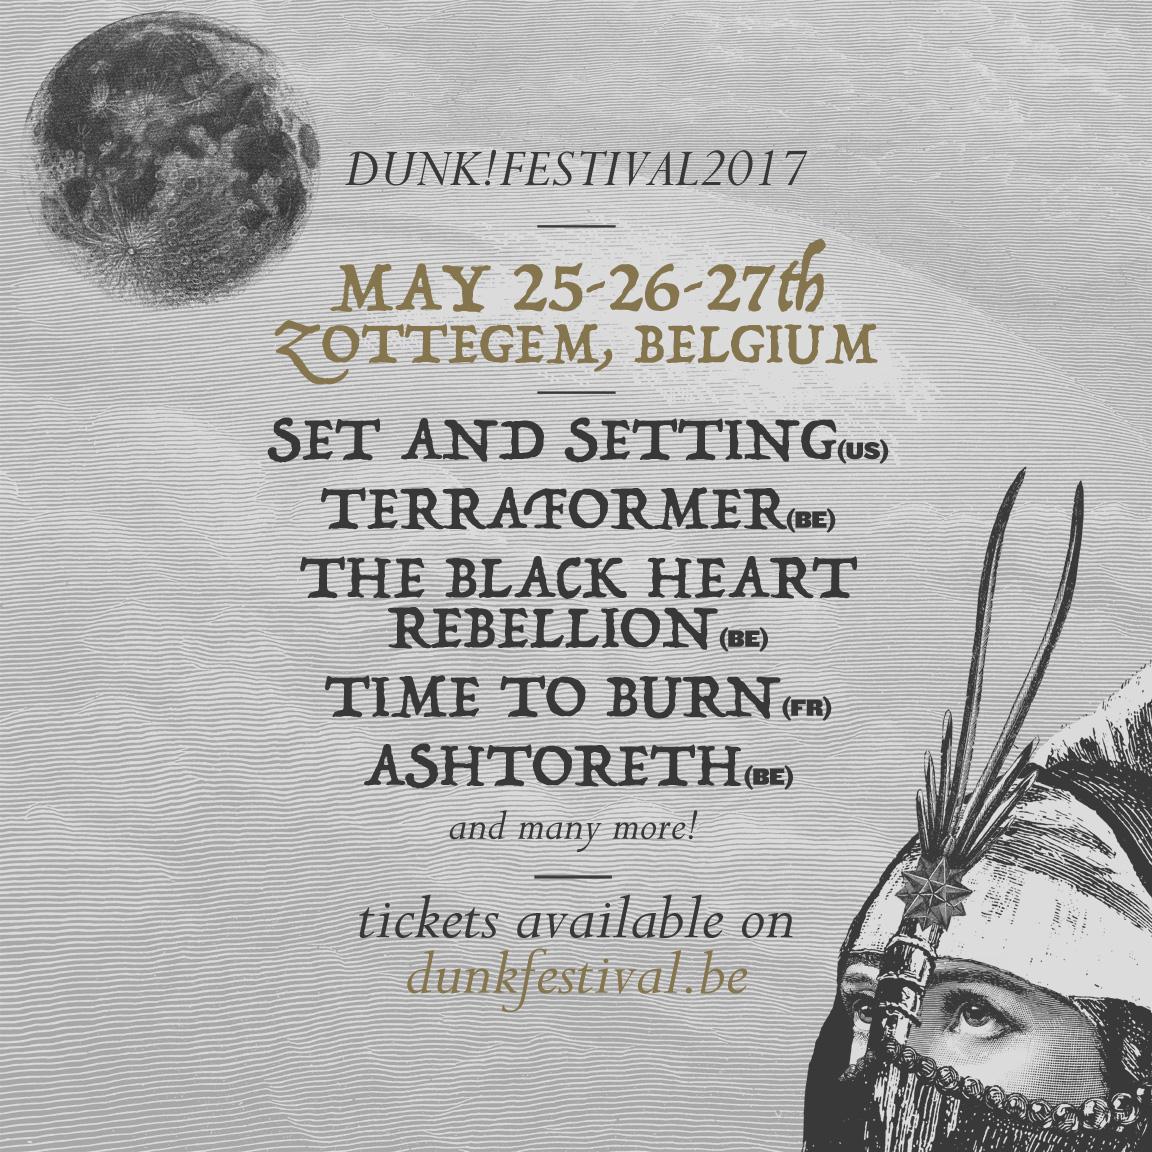 Dunk festival 0d762cc6-4987-4ce5-9514-c61cd95e083f